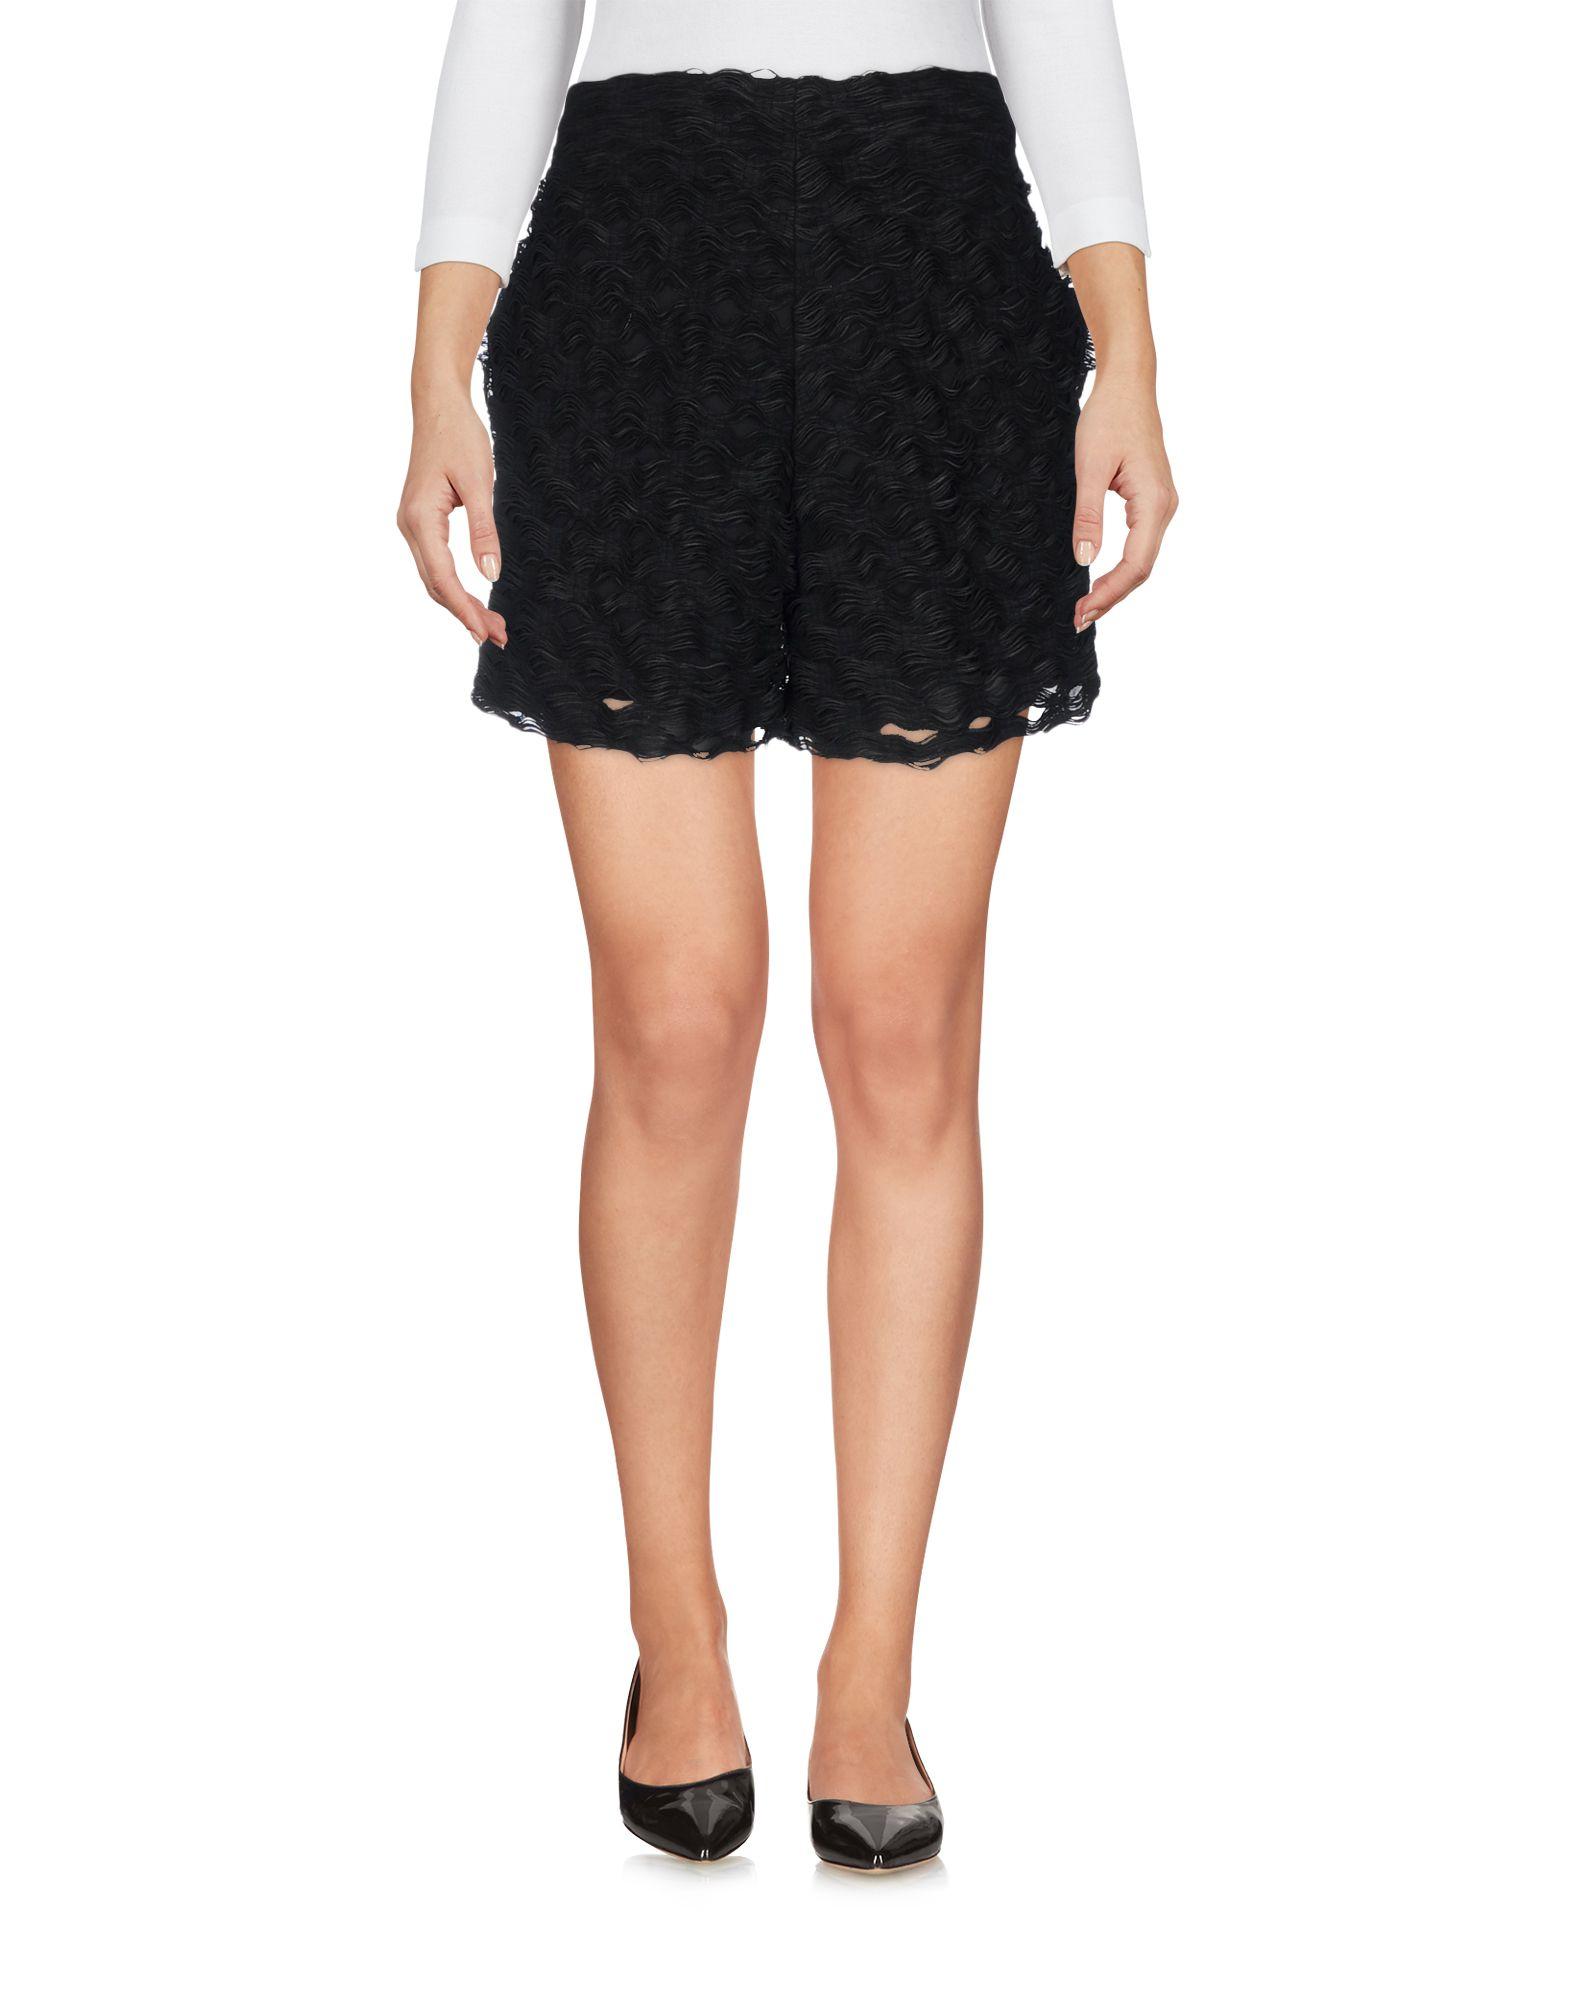 Shorts Shorts & Bermuda Federica Tosi donna - 13083883LH